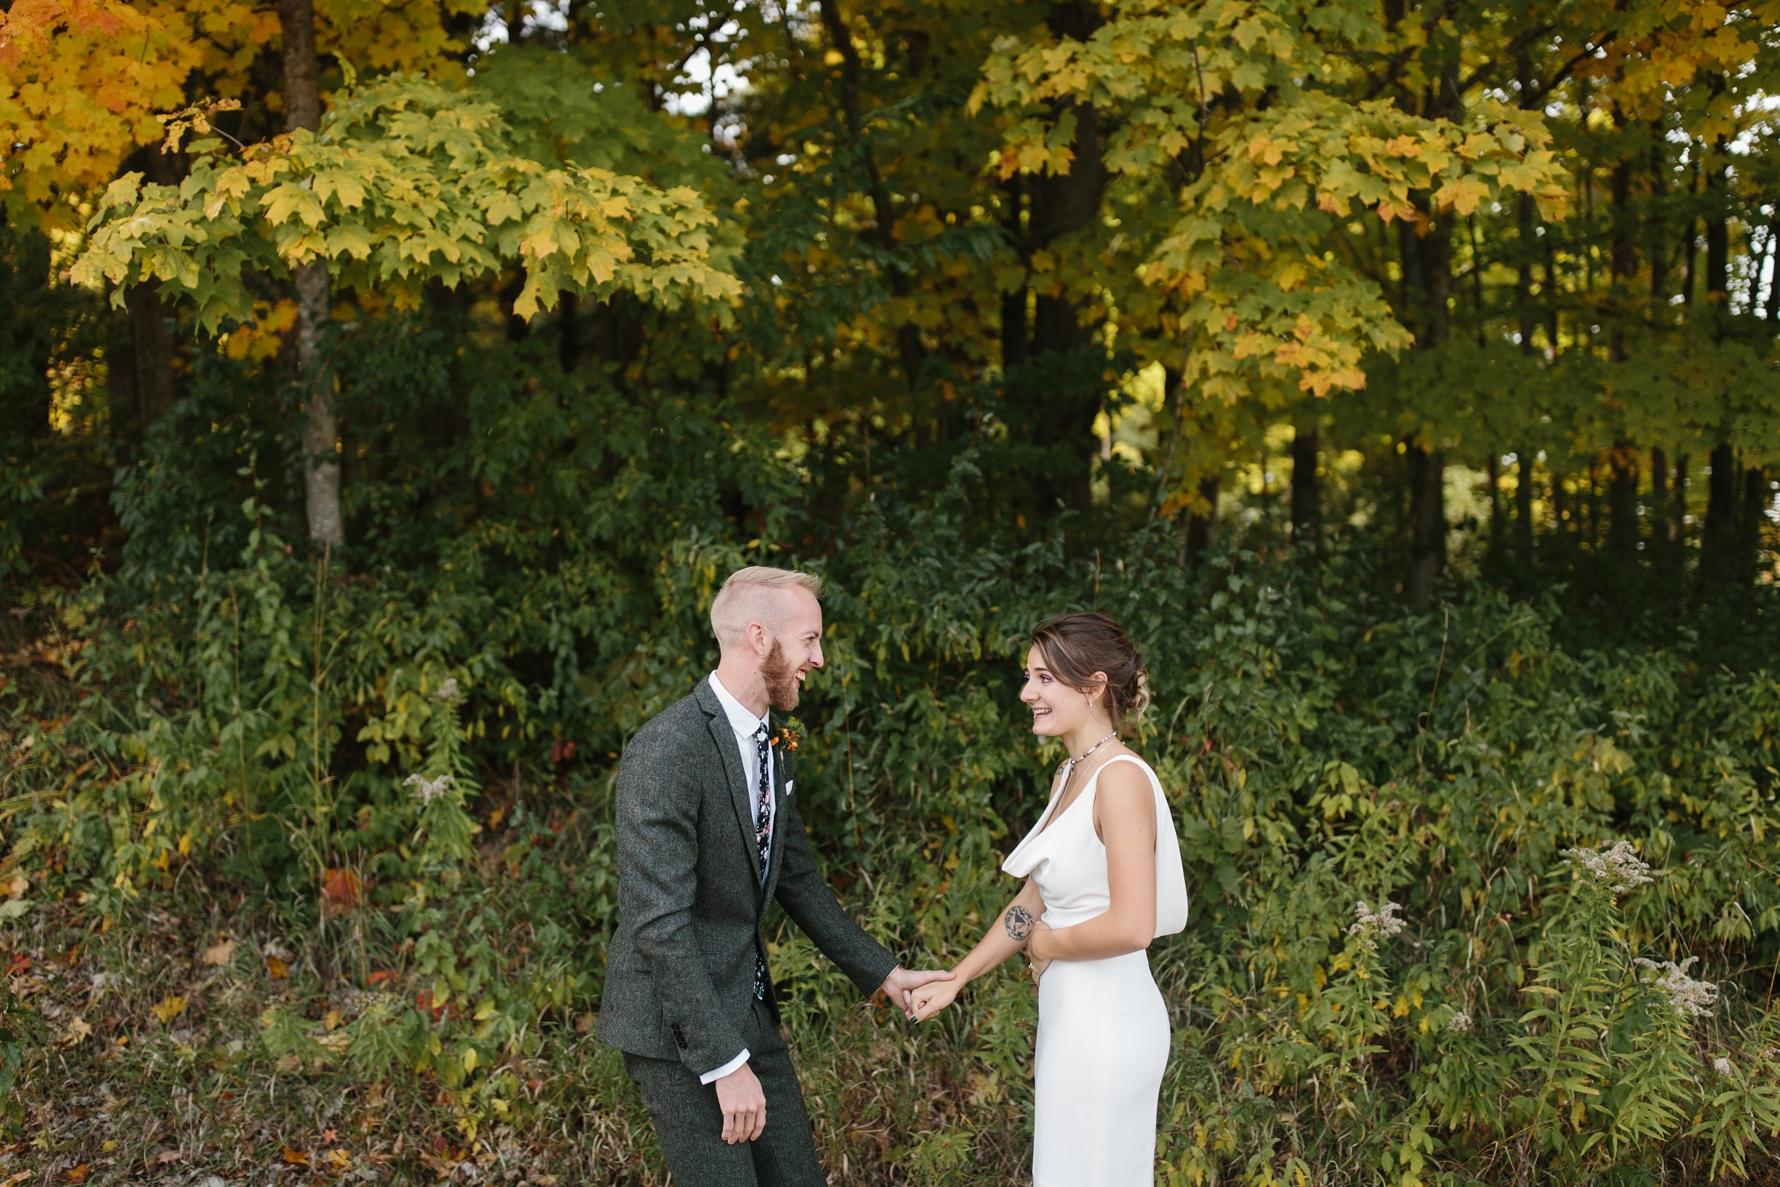 norris-traverse-city-wedding-17.JPG